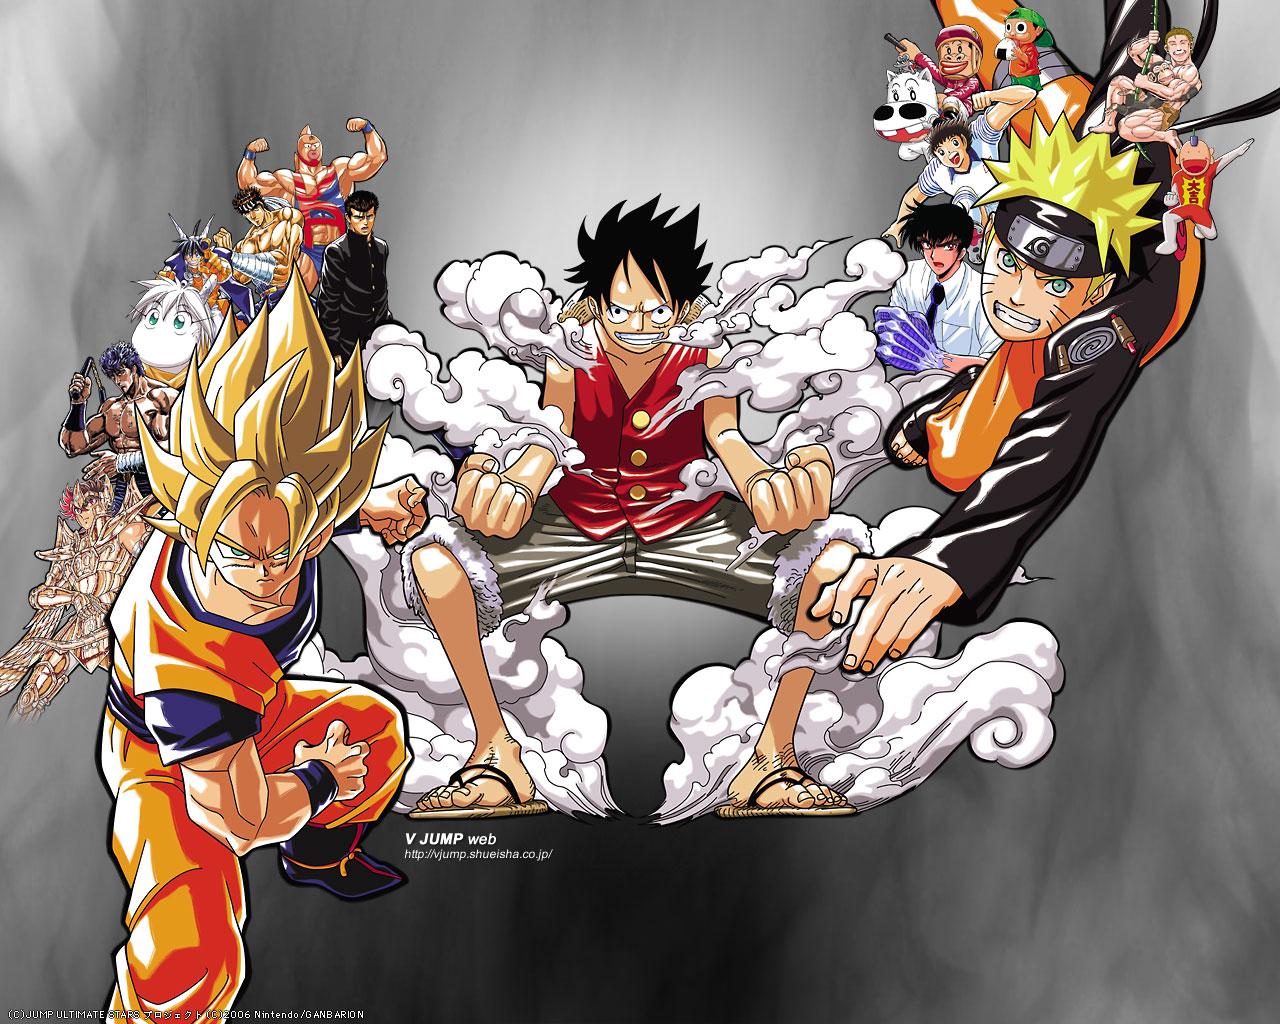 Goku Vs Naruto Best Developer Wallpaper Coloring Online 1280x1024